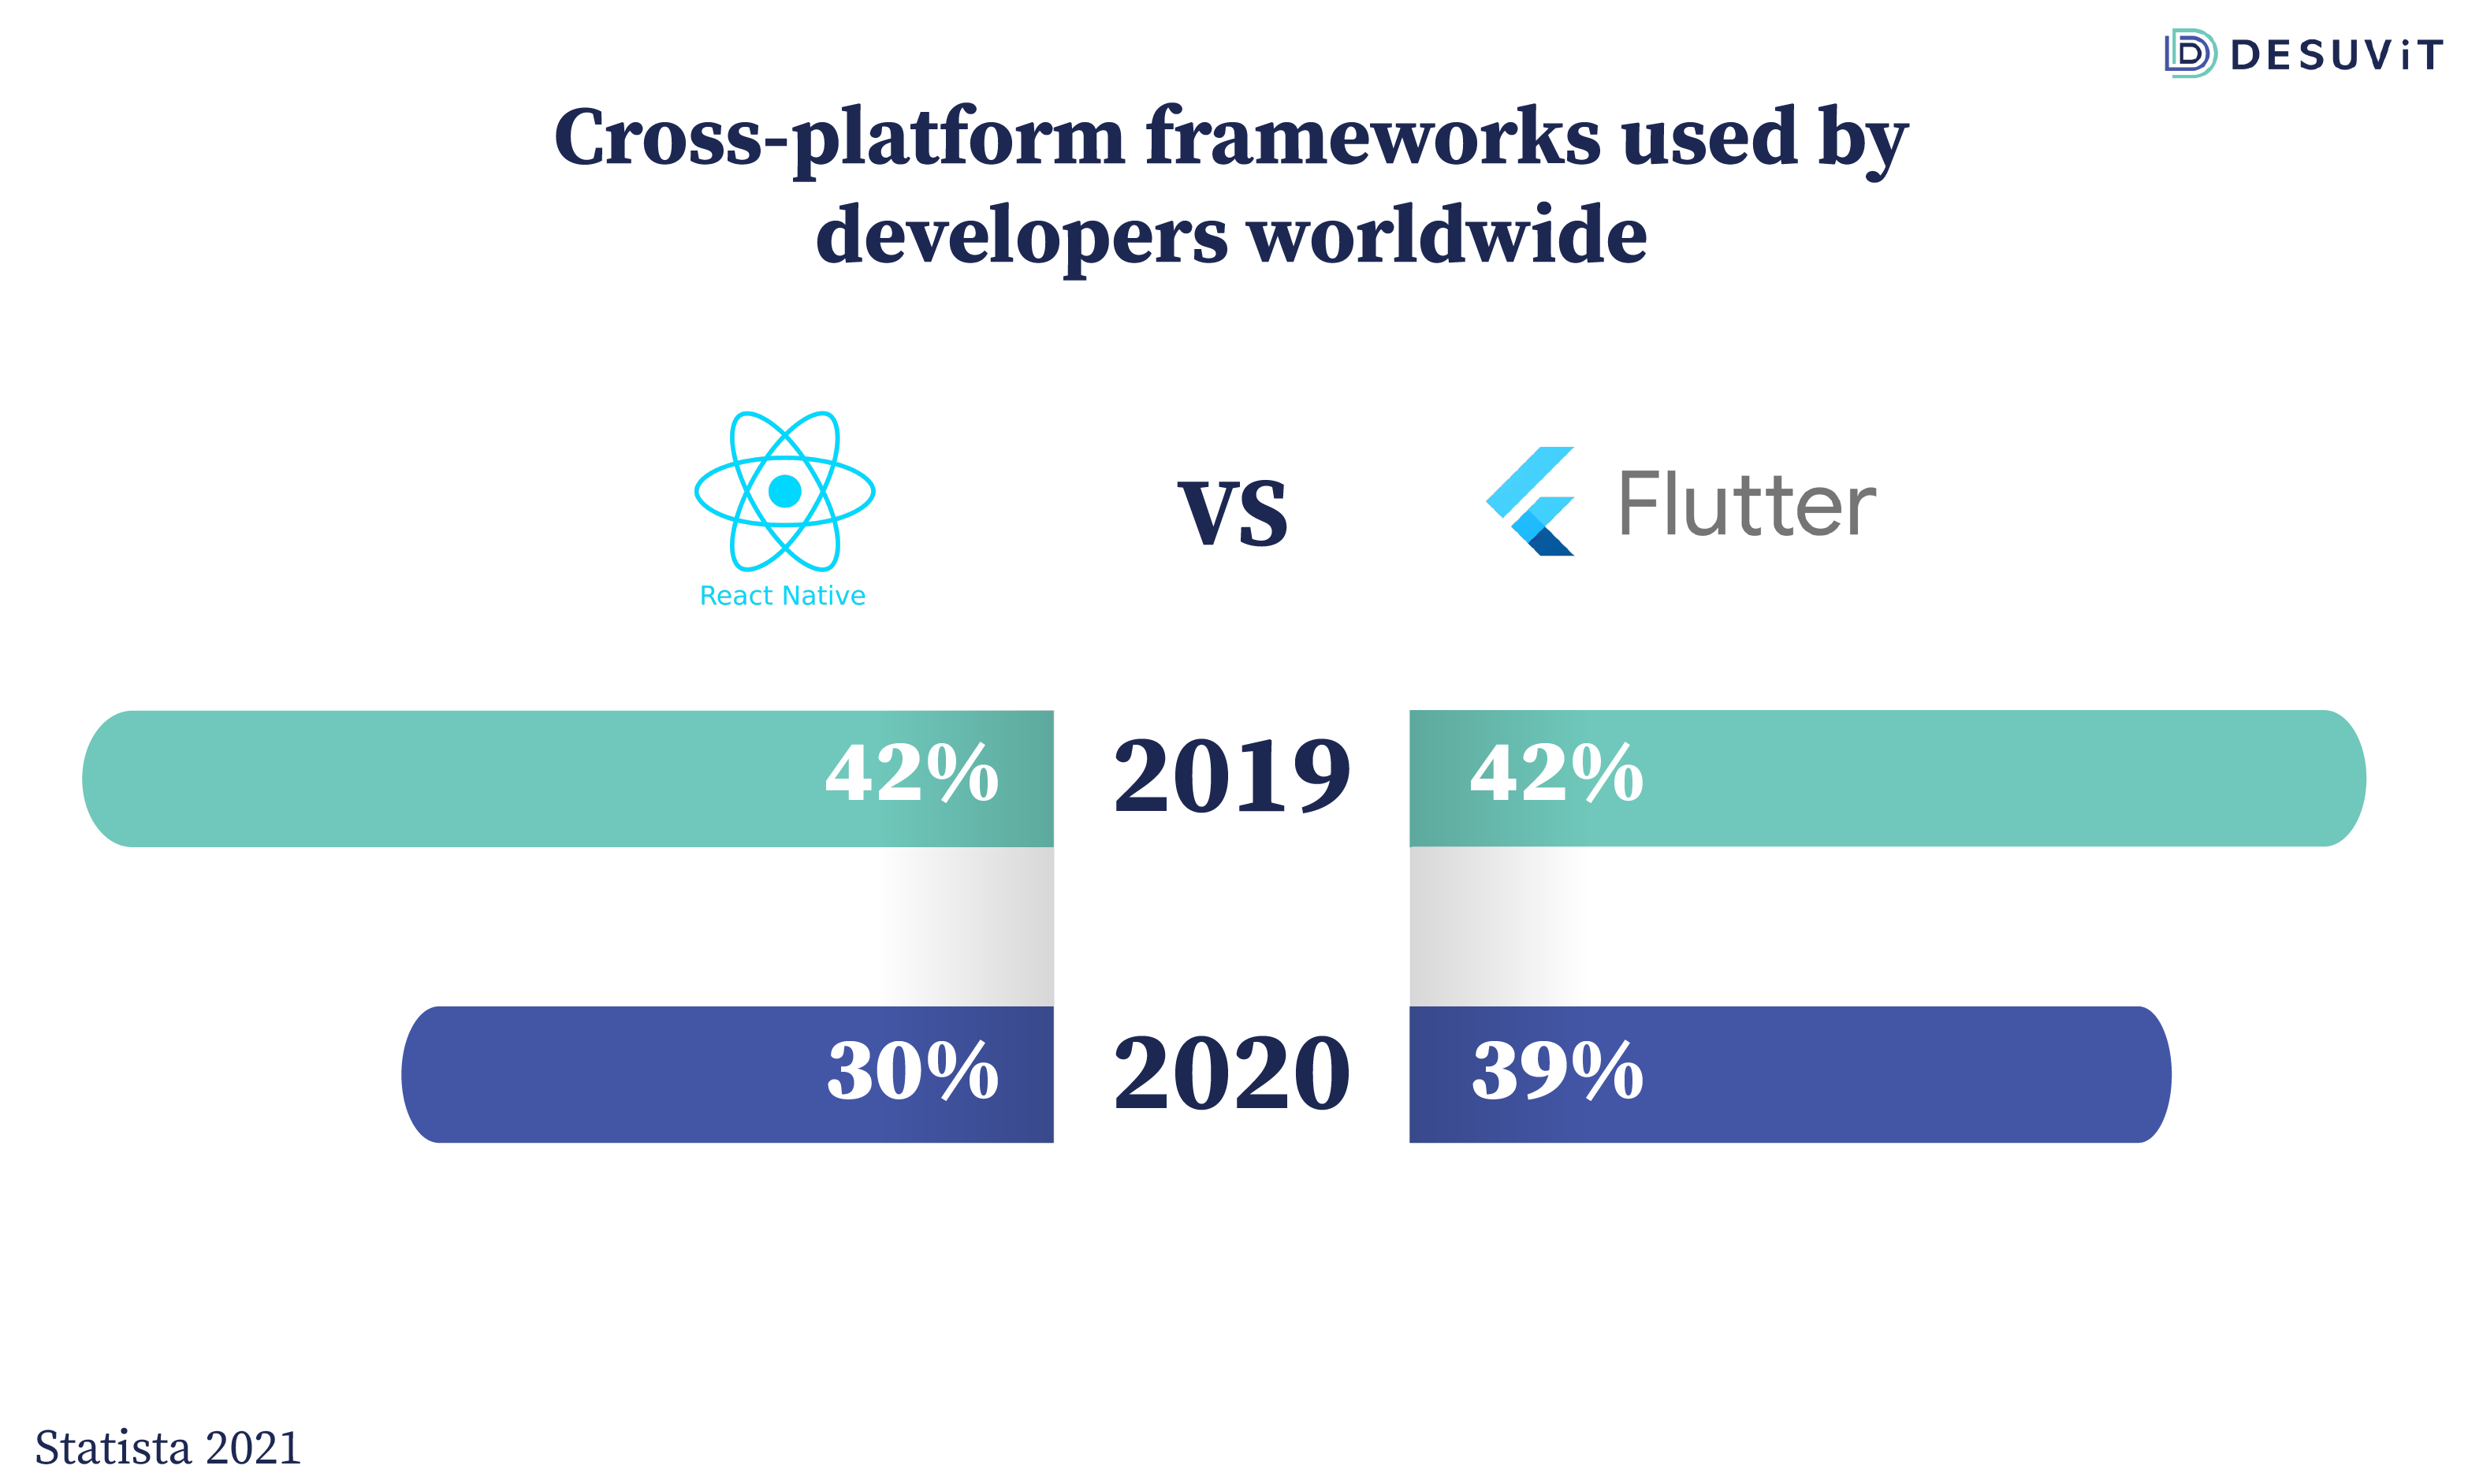 Cross platform frameworks used by developers worldwide